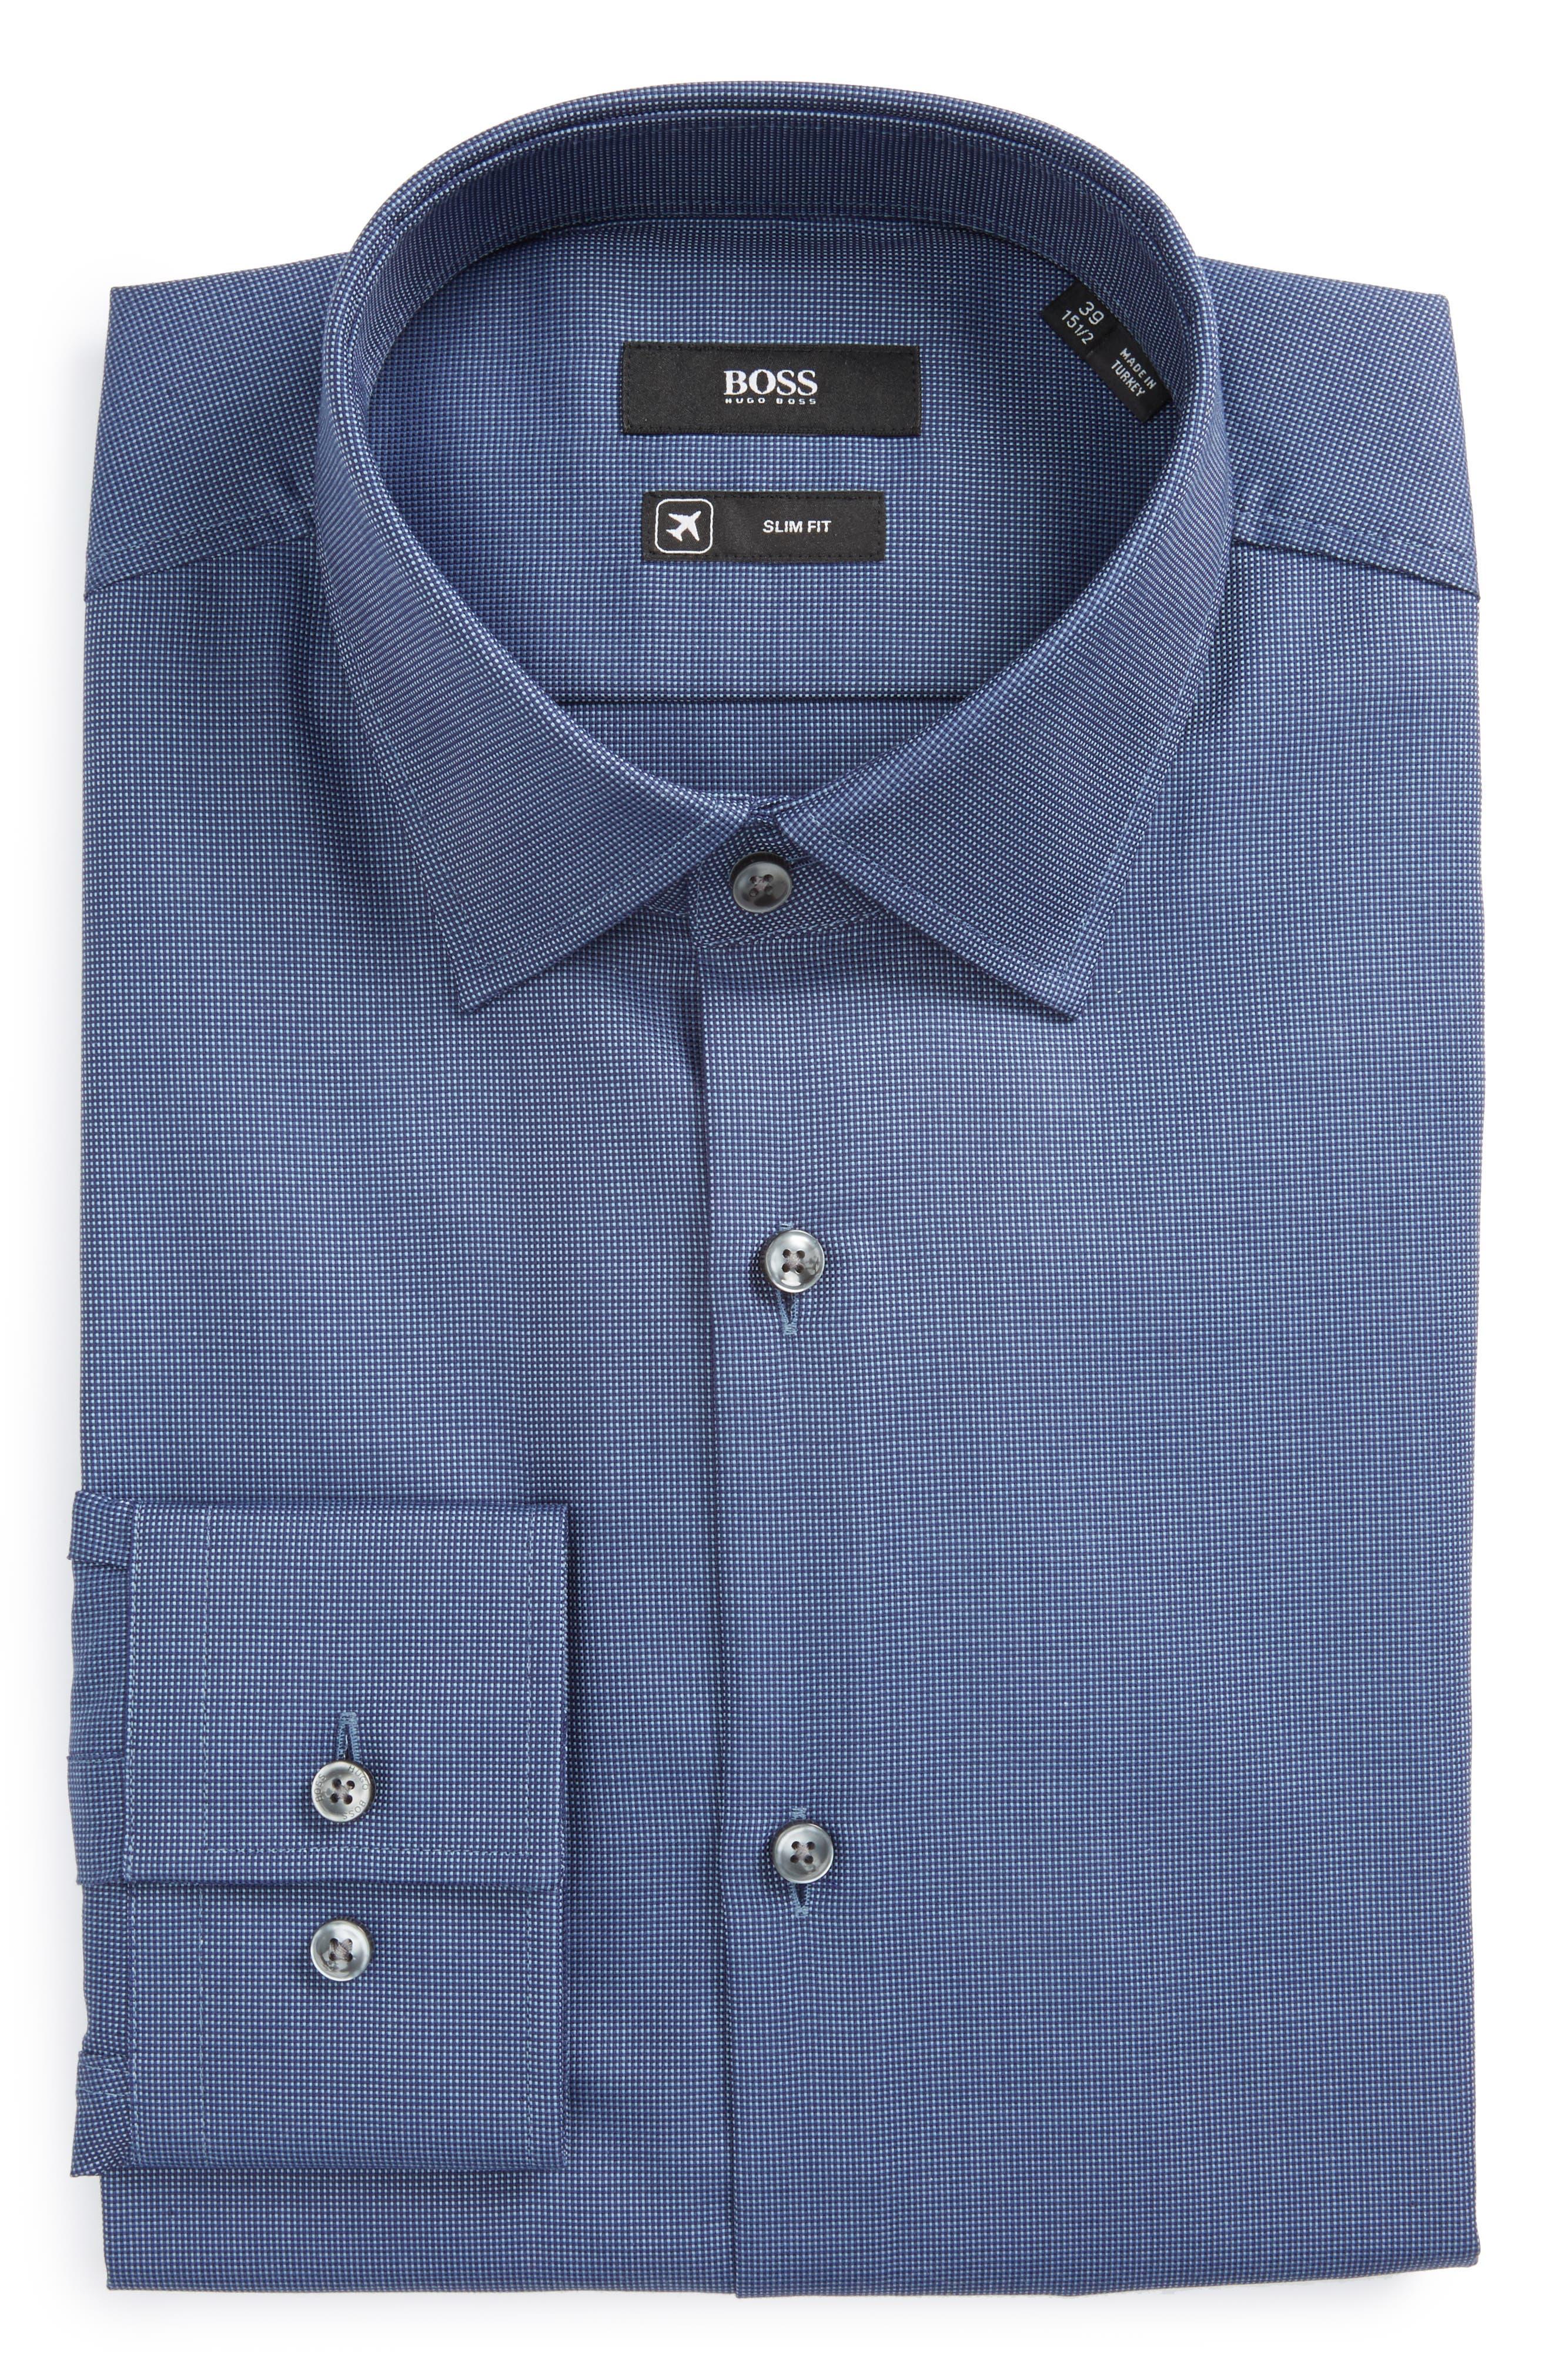 Jenno Slim Fit Solid Dress Shirt,                         Main,                         color, 421